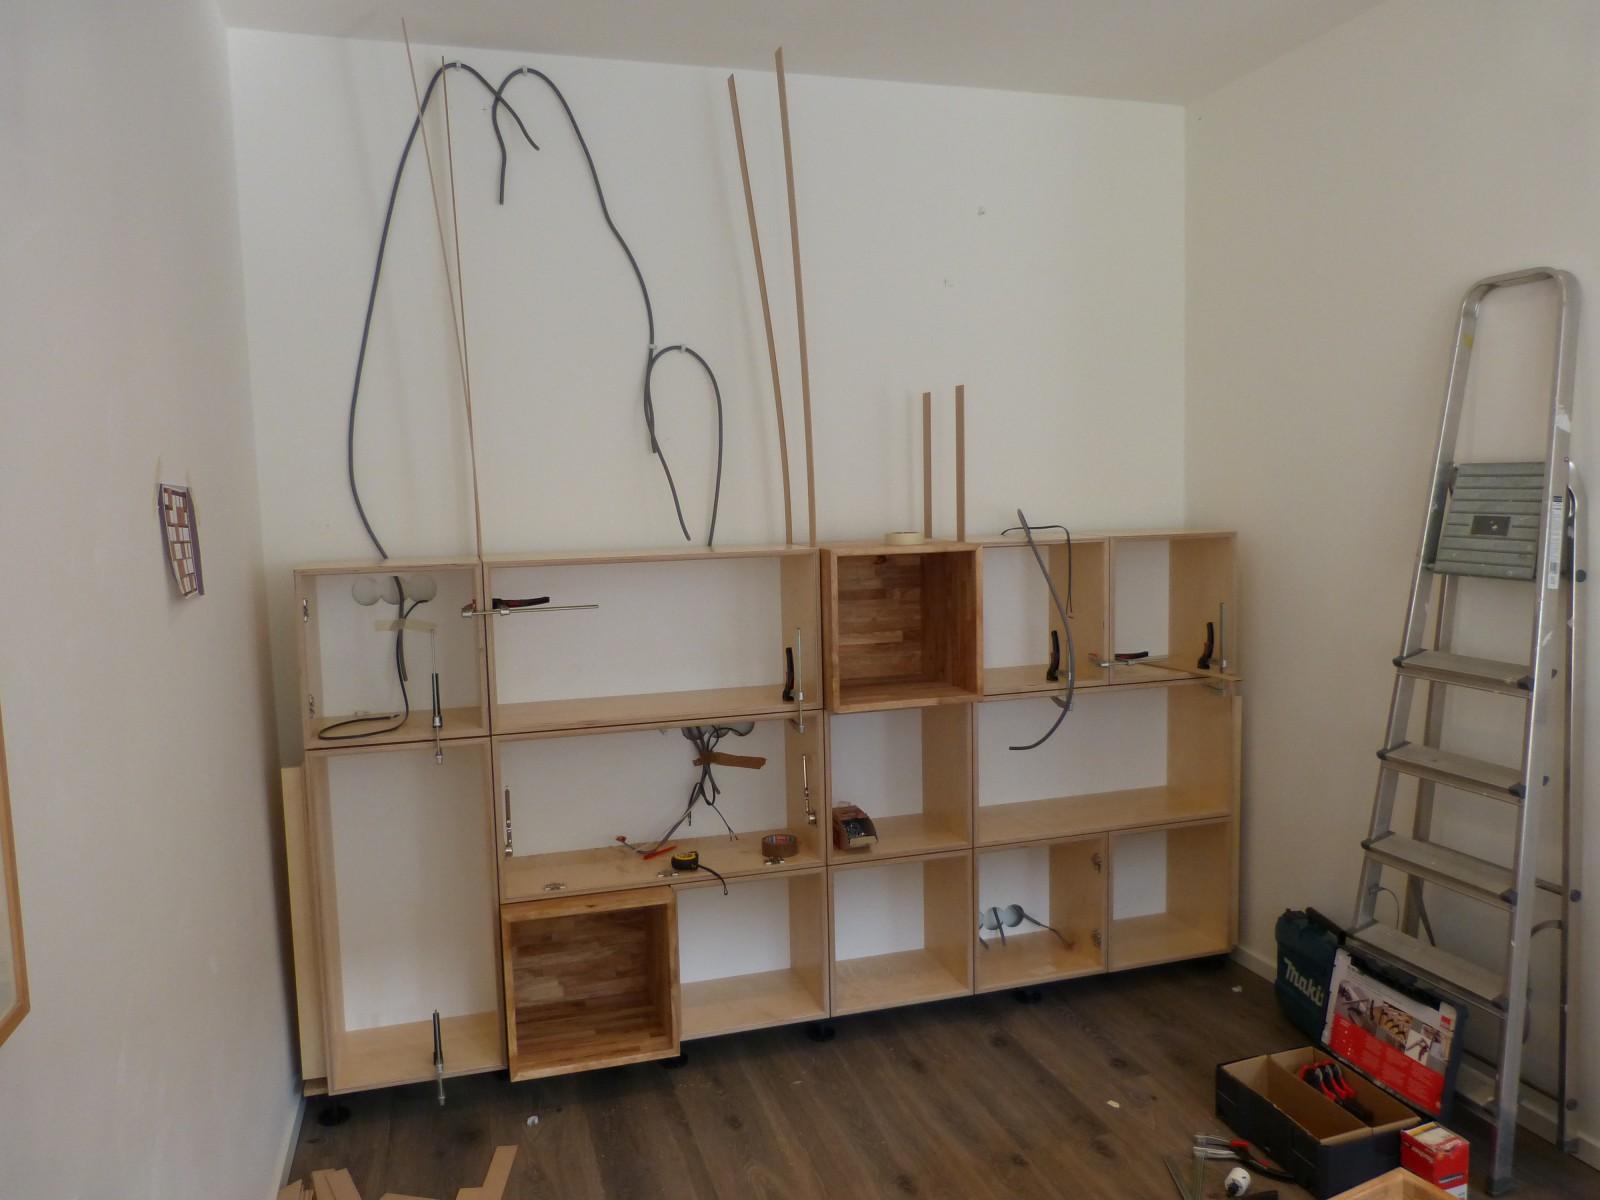 kubuskast wandmeubel boekenkast Deuvel Design 2